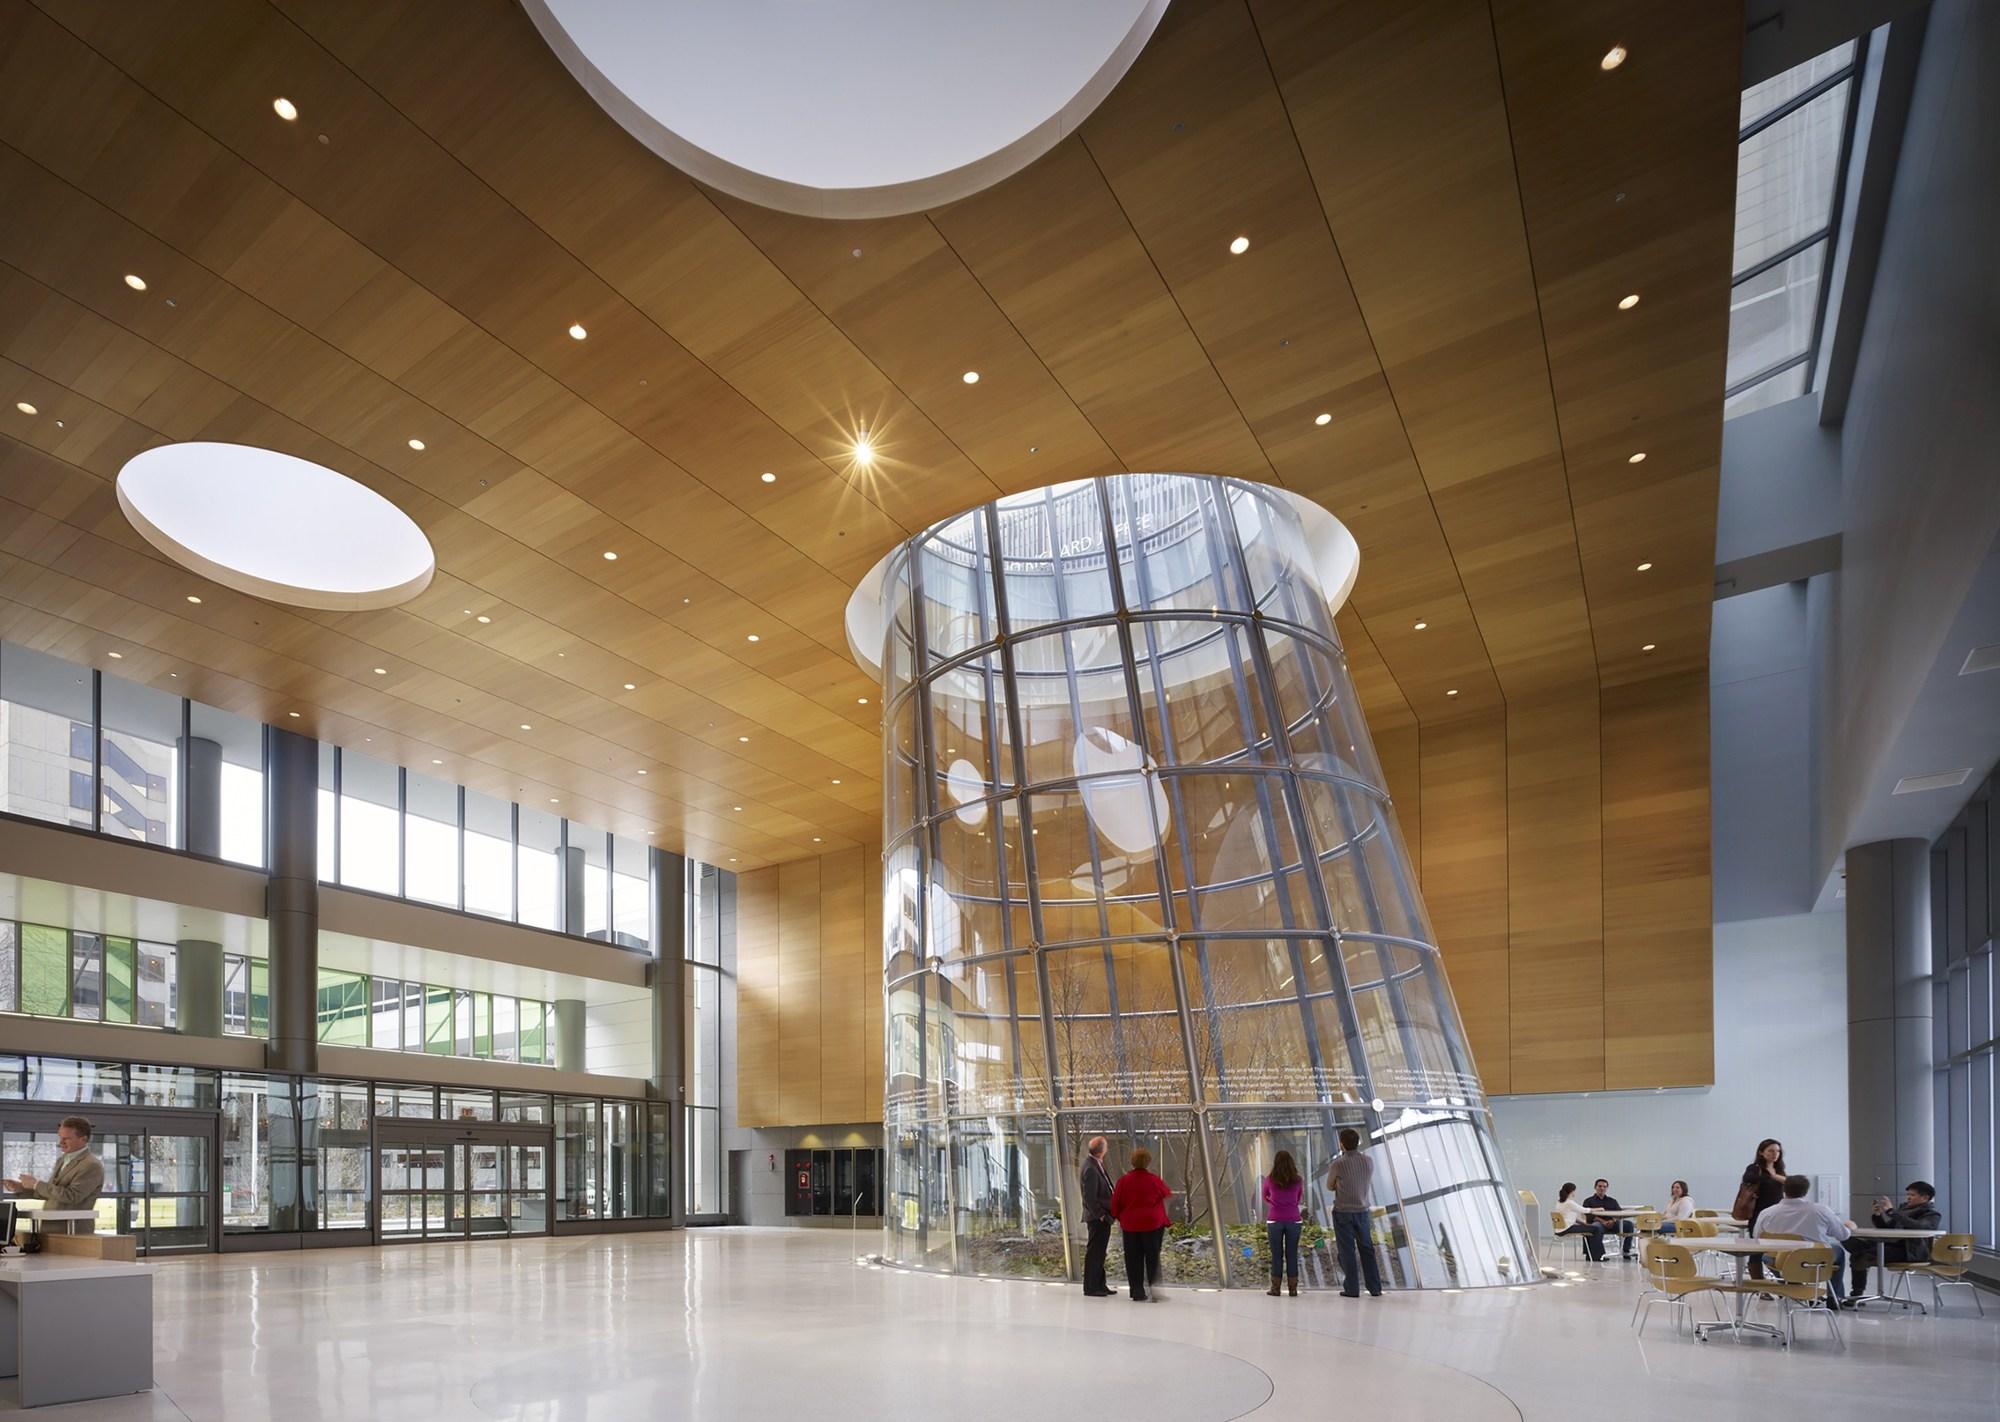 New Hospital Tower Rush University Medical Center / Perkins+